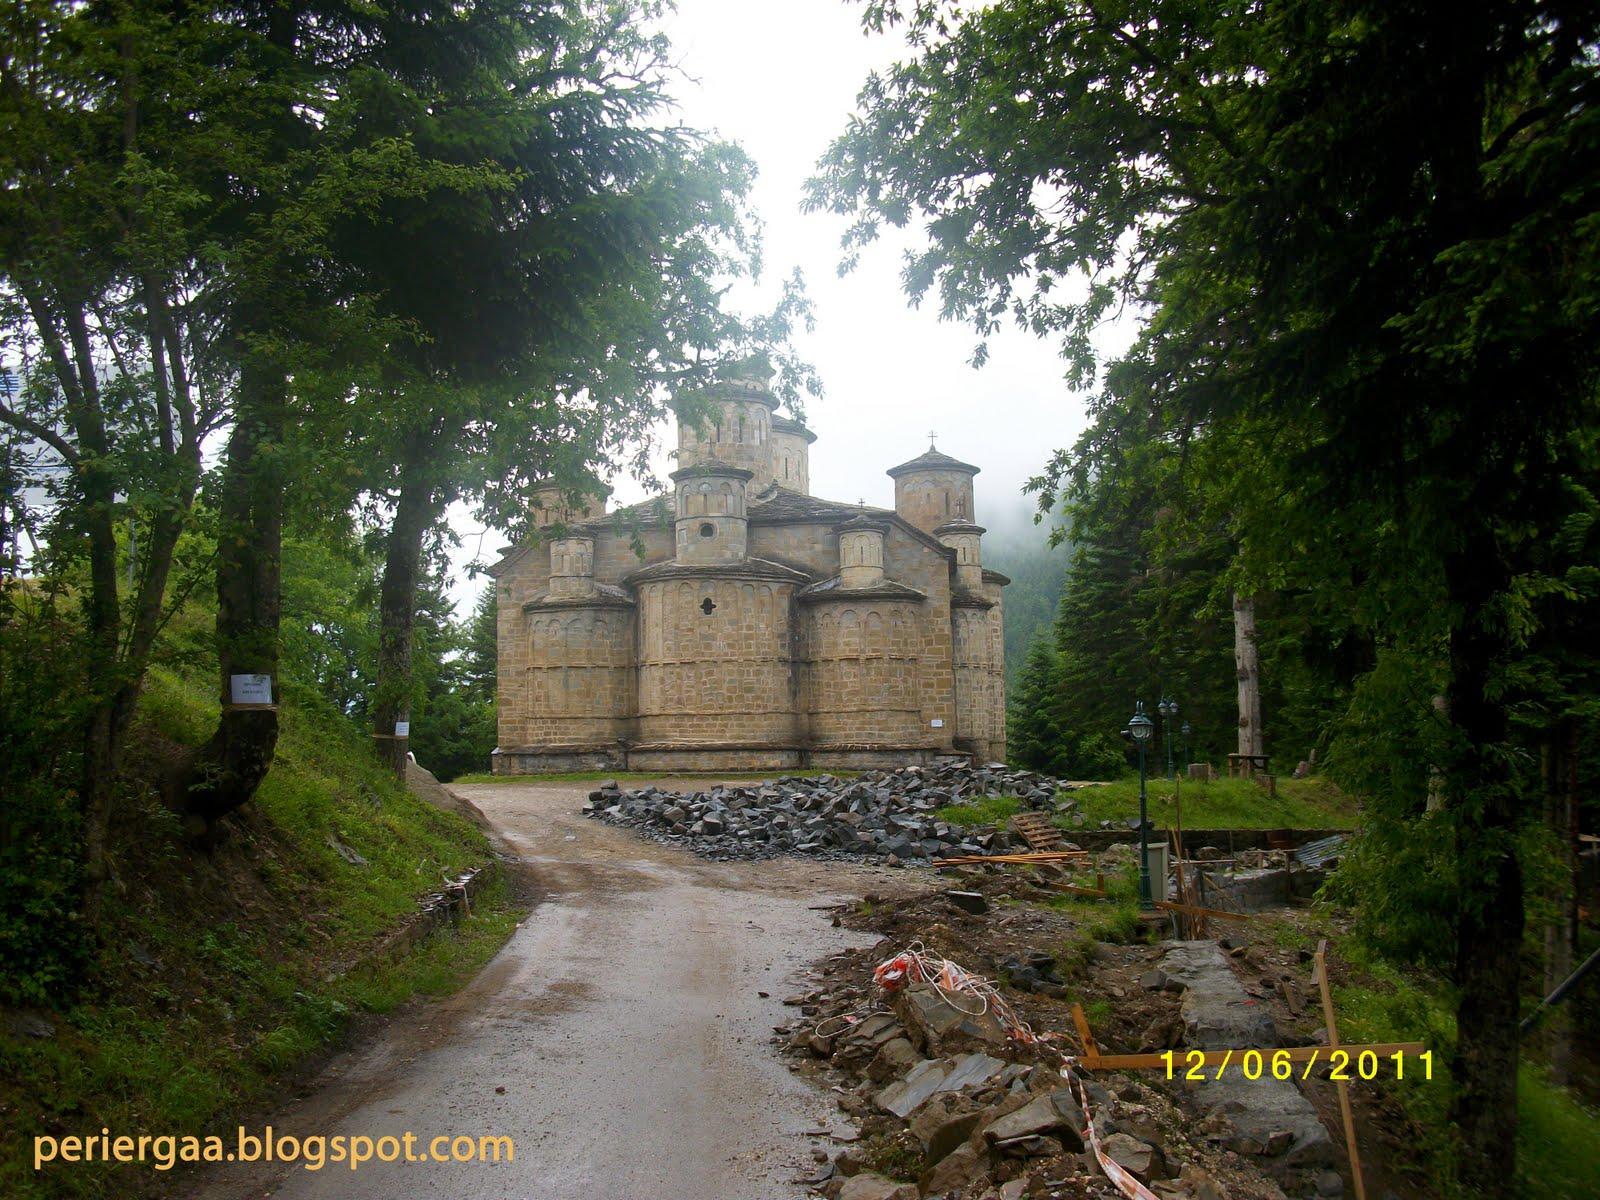 Periergaa lost empire - Div onclick href ...